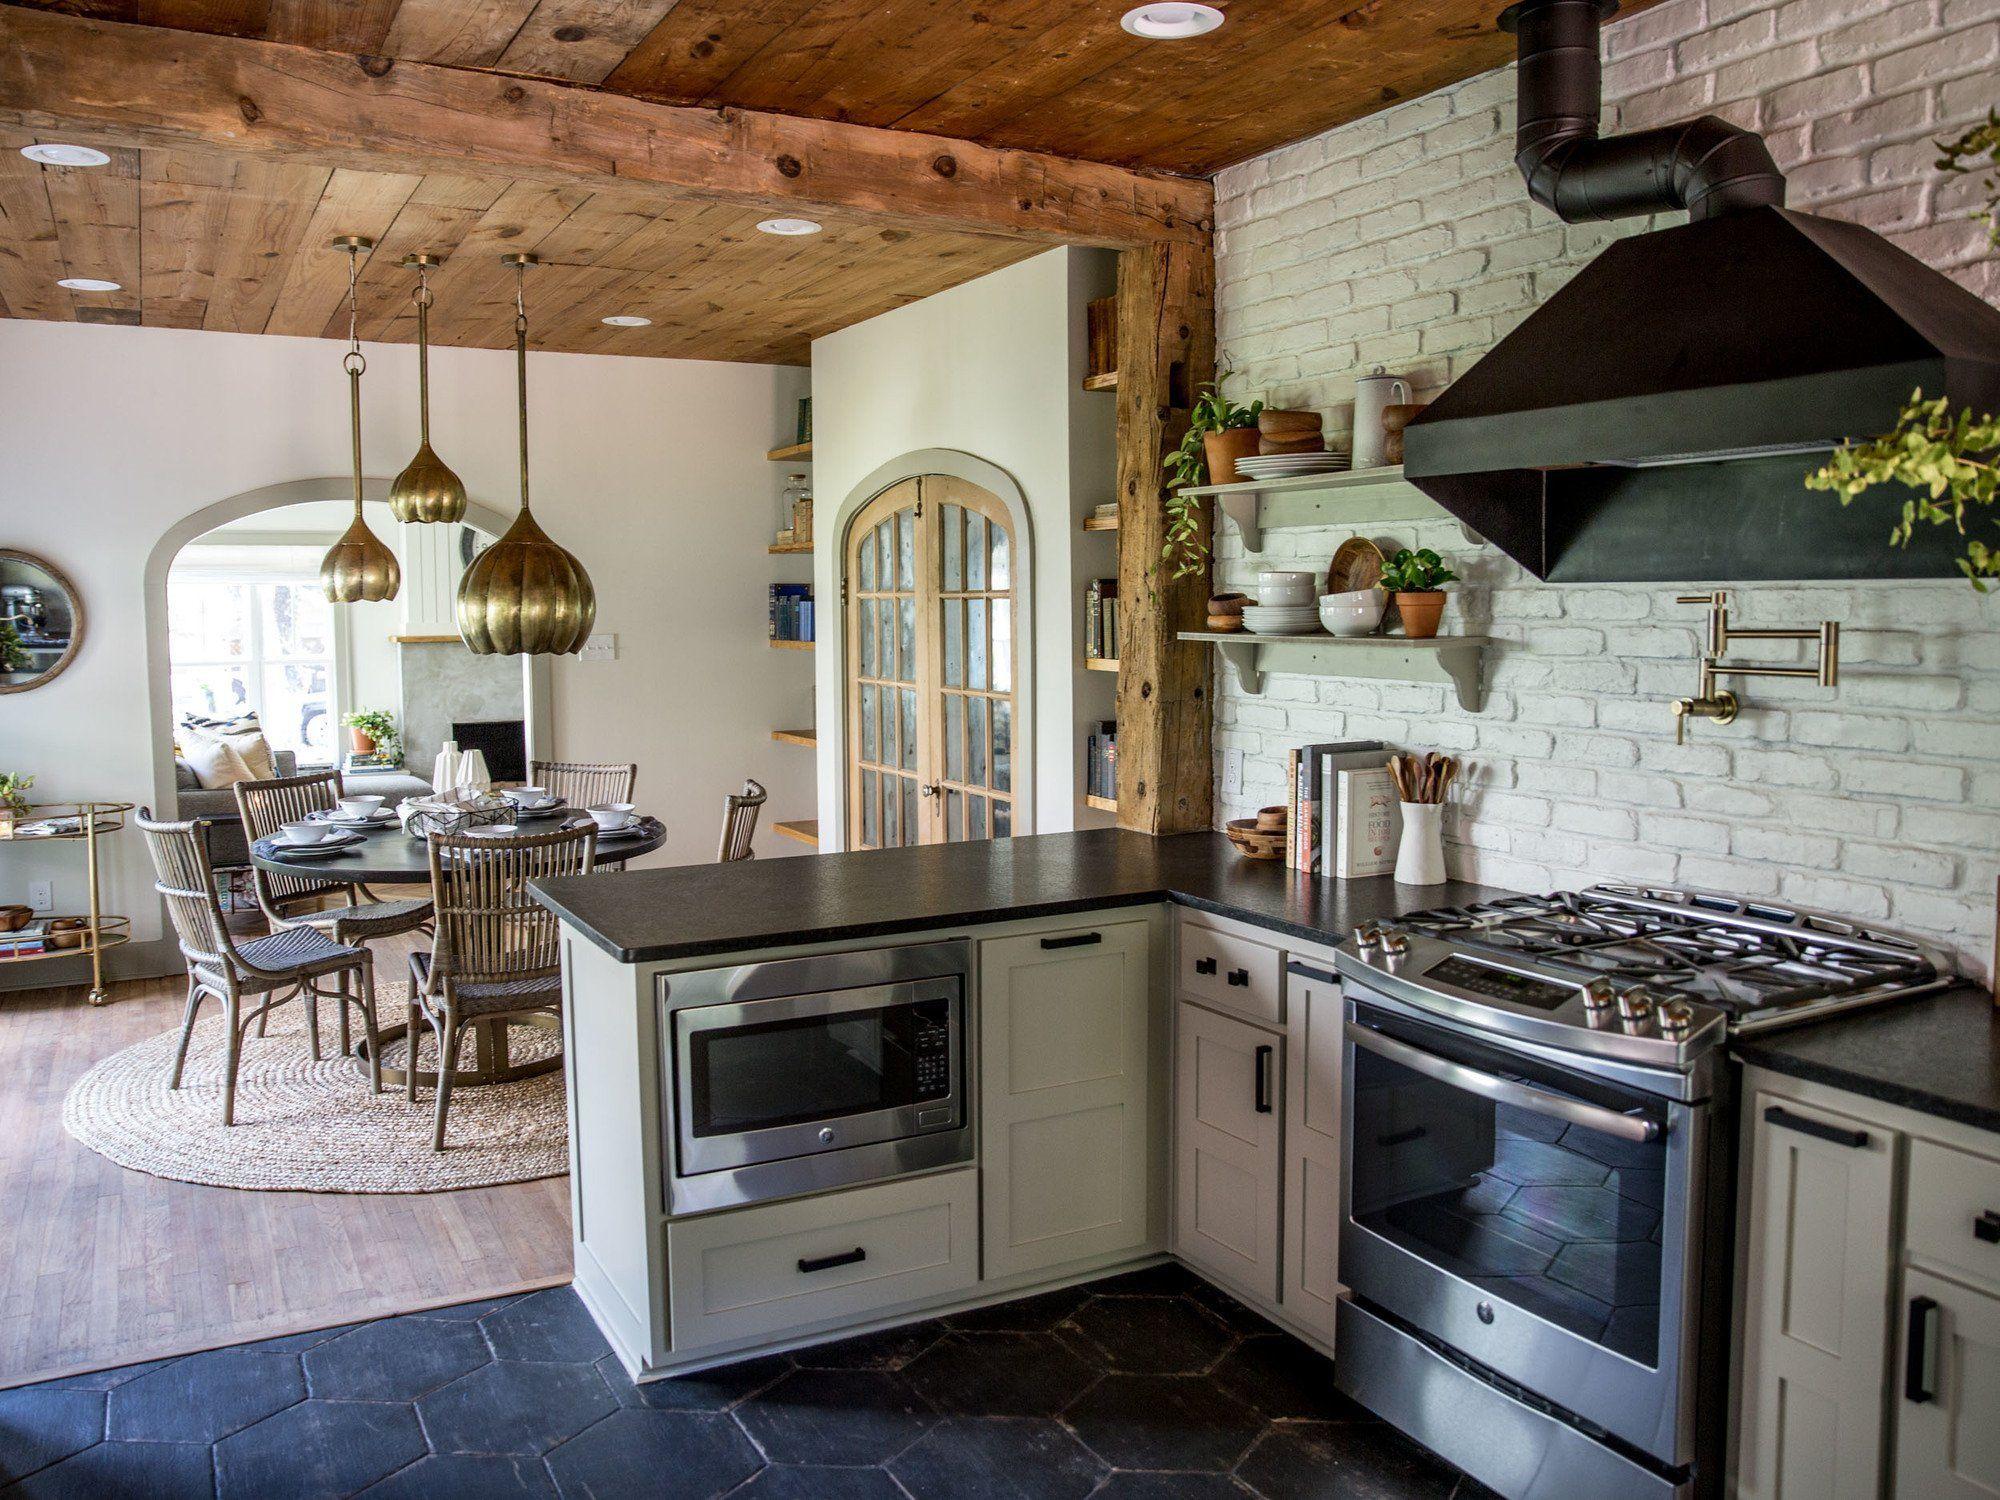 Chip And Joanna Gaines Fixer Upper Kitchen Episode 15 The Giraffe House Progetti Kitchen